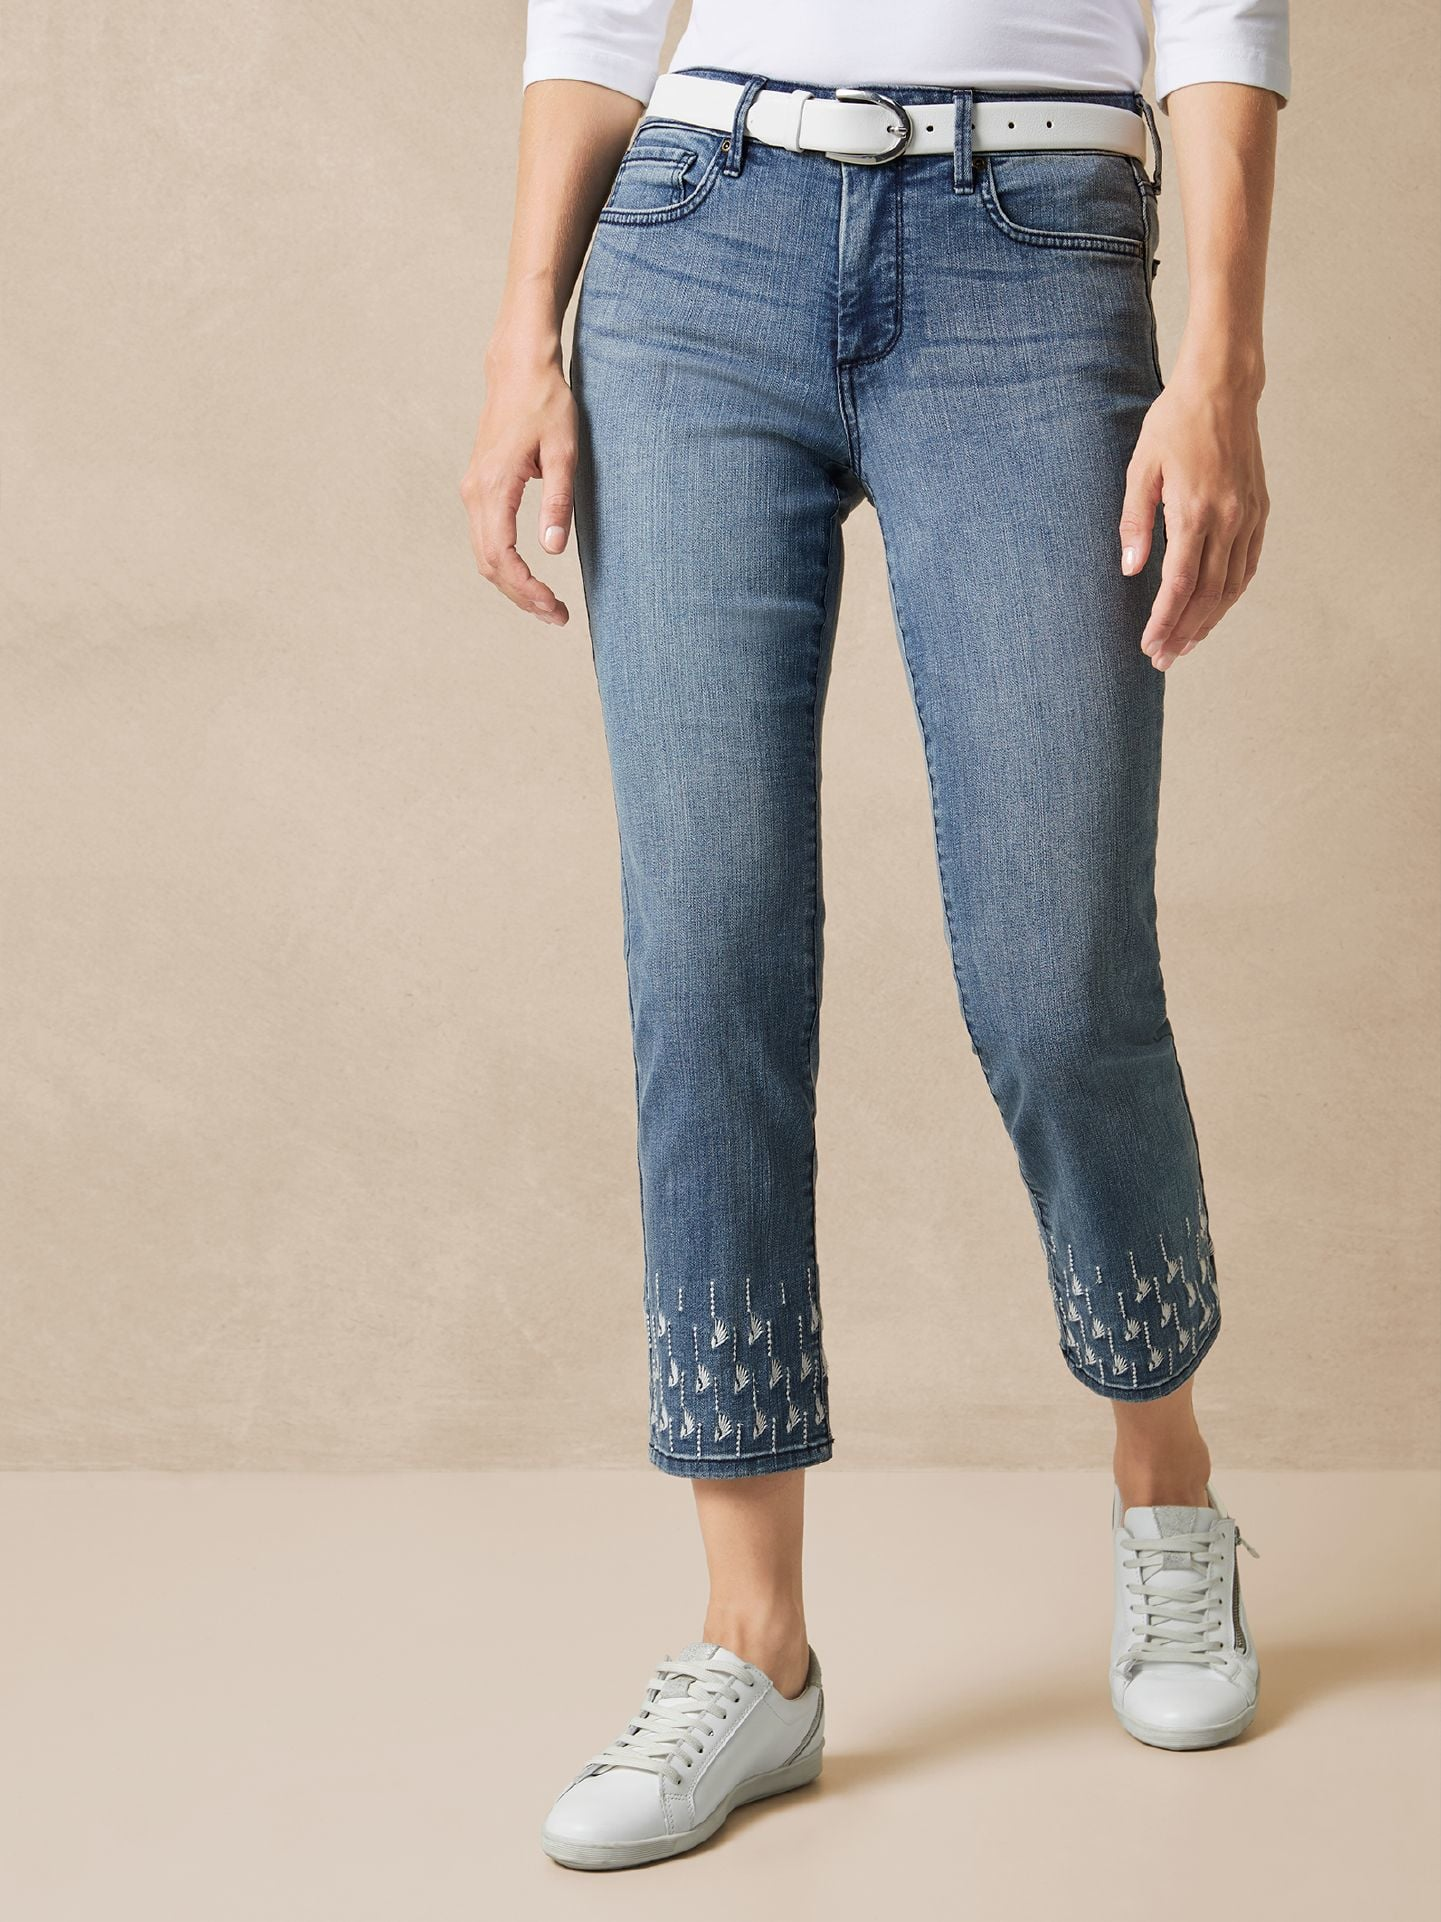 NYDJ Damen Ankle Jeans Stickerei Größe 42